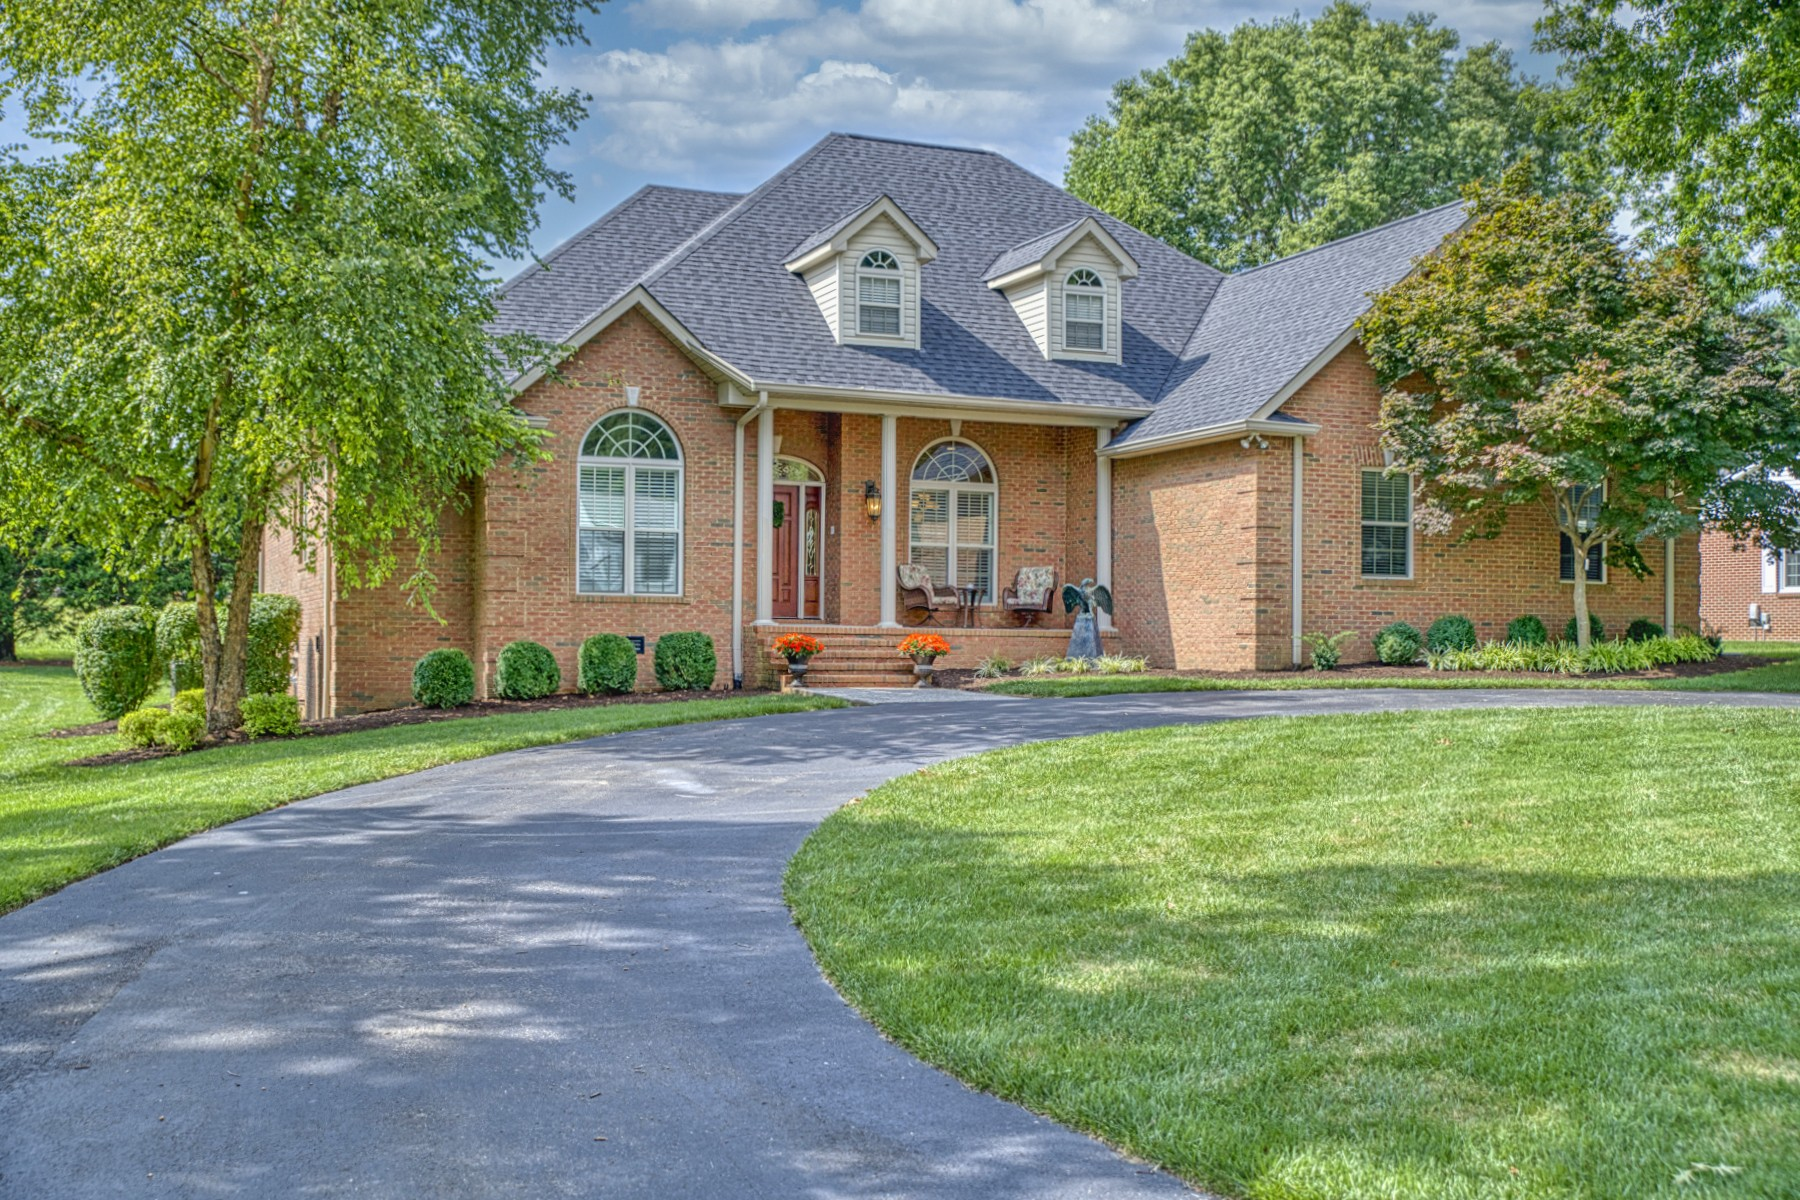 1511 Barnes Dr Property Photo - Cookeville, TN real estate listing